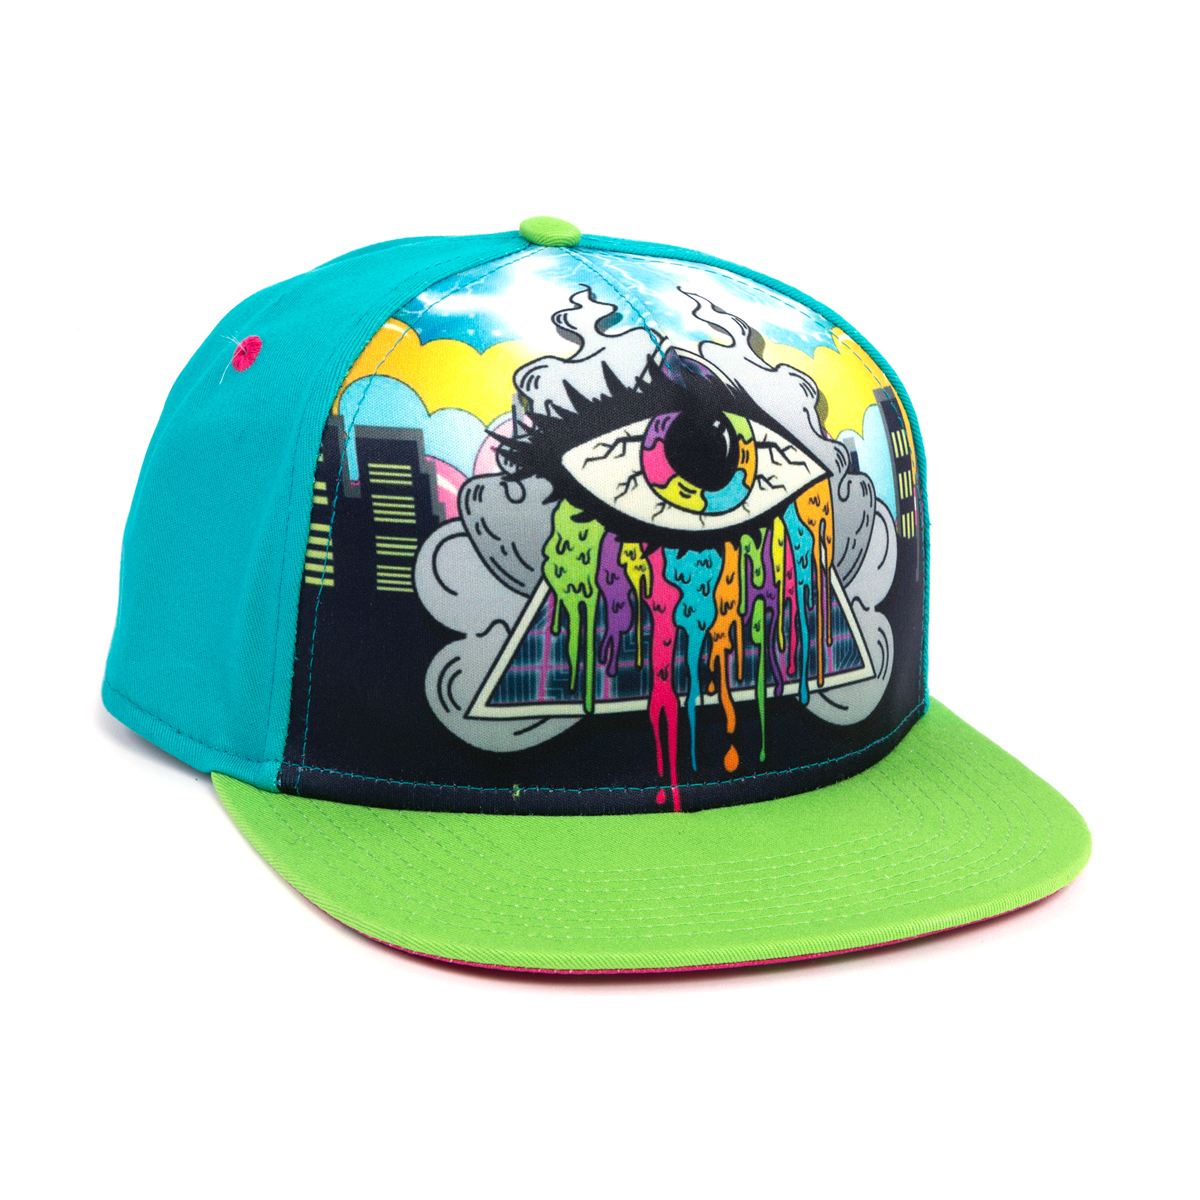 Hijinx Event Flat Brim Hat